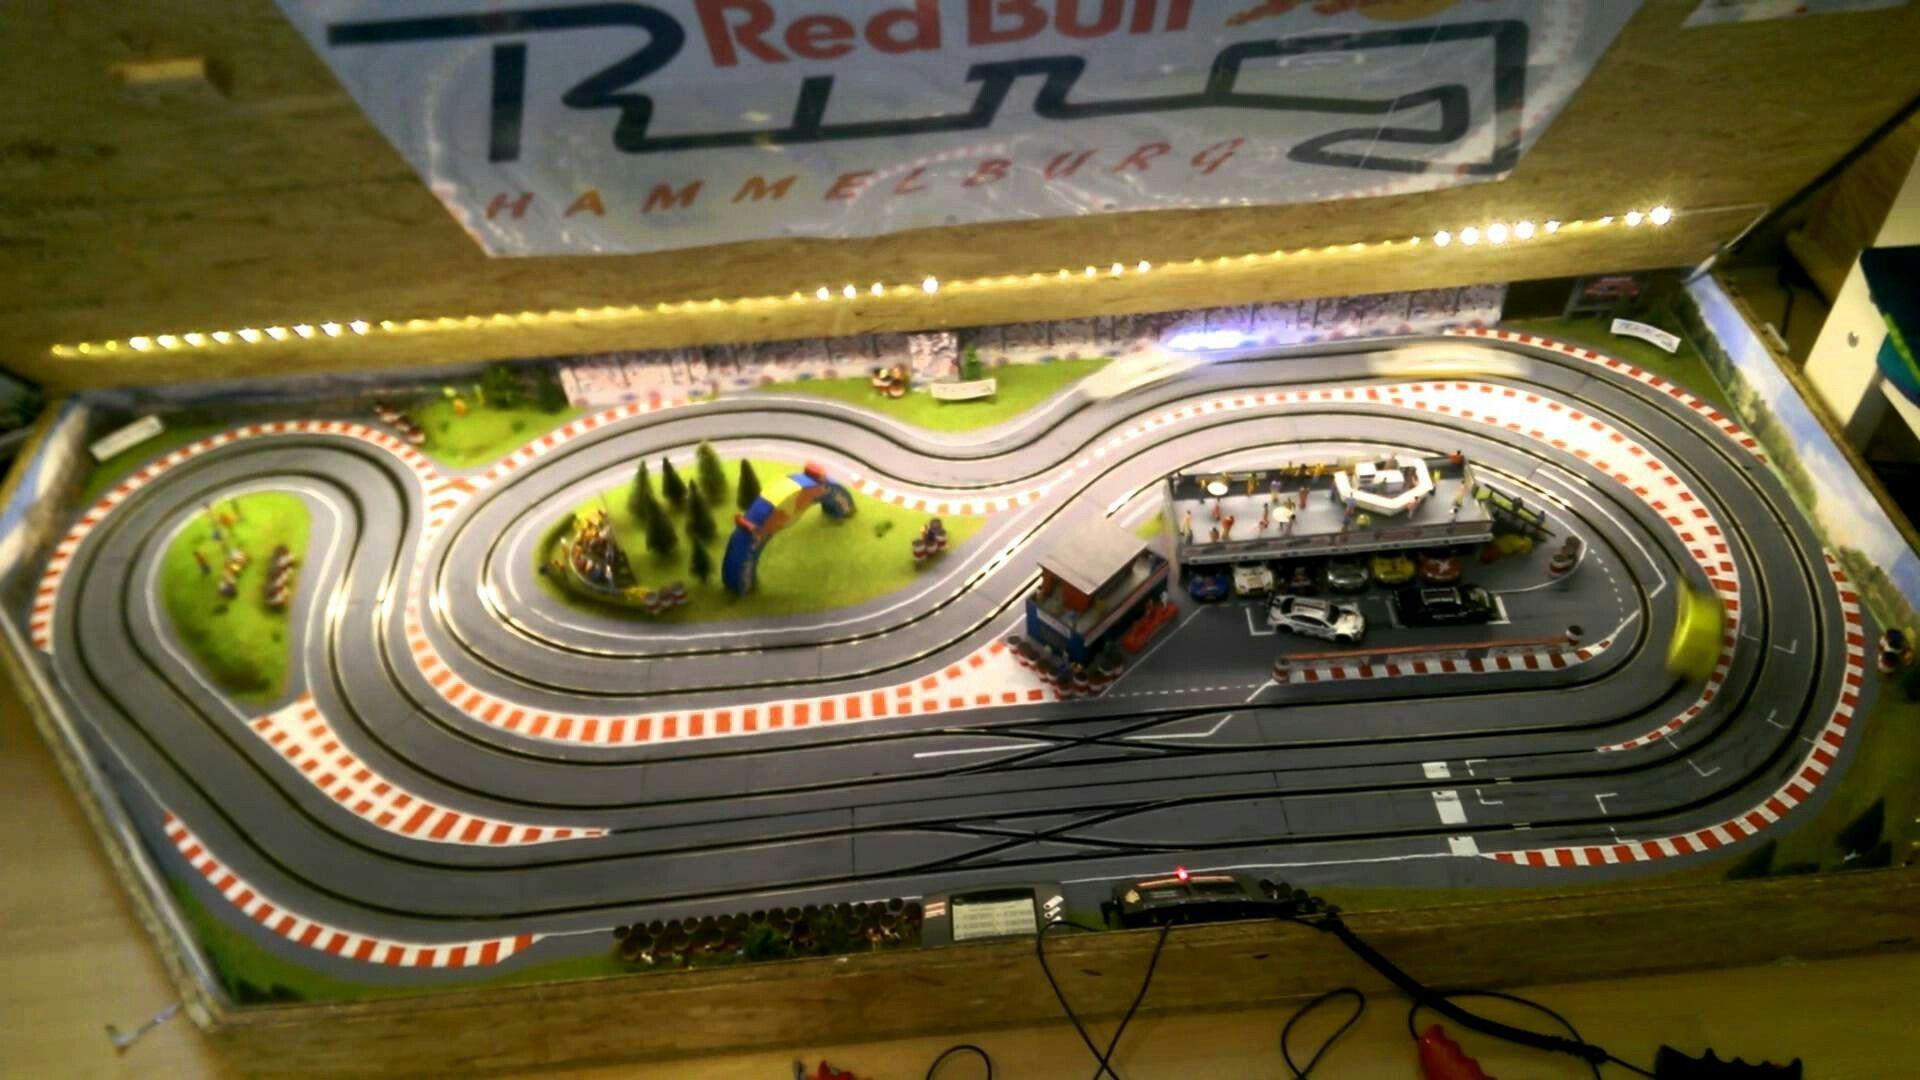 Pin By Hector On Slot Racing Carrera Slot Cars Slot Cars Slot Racing